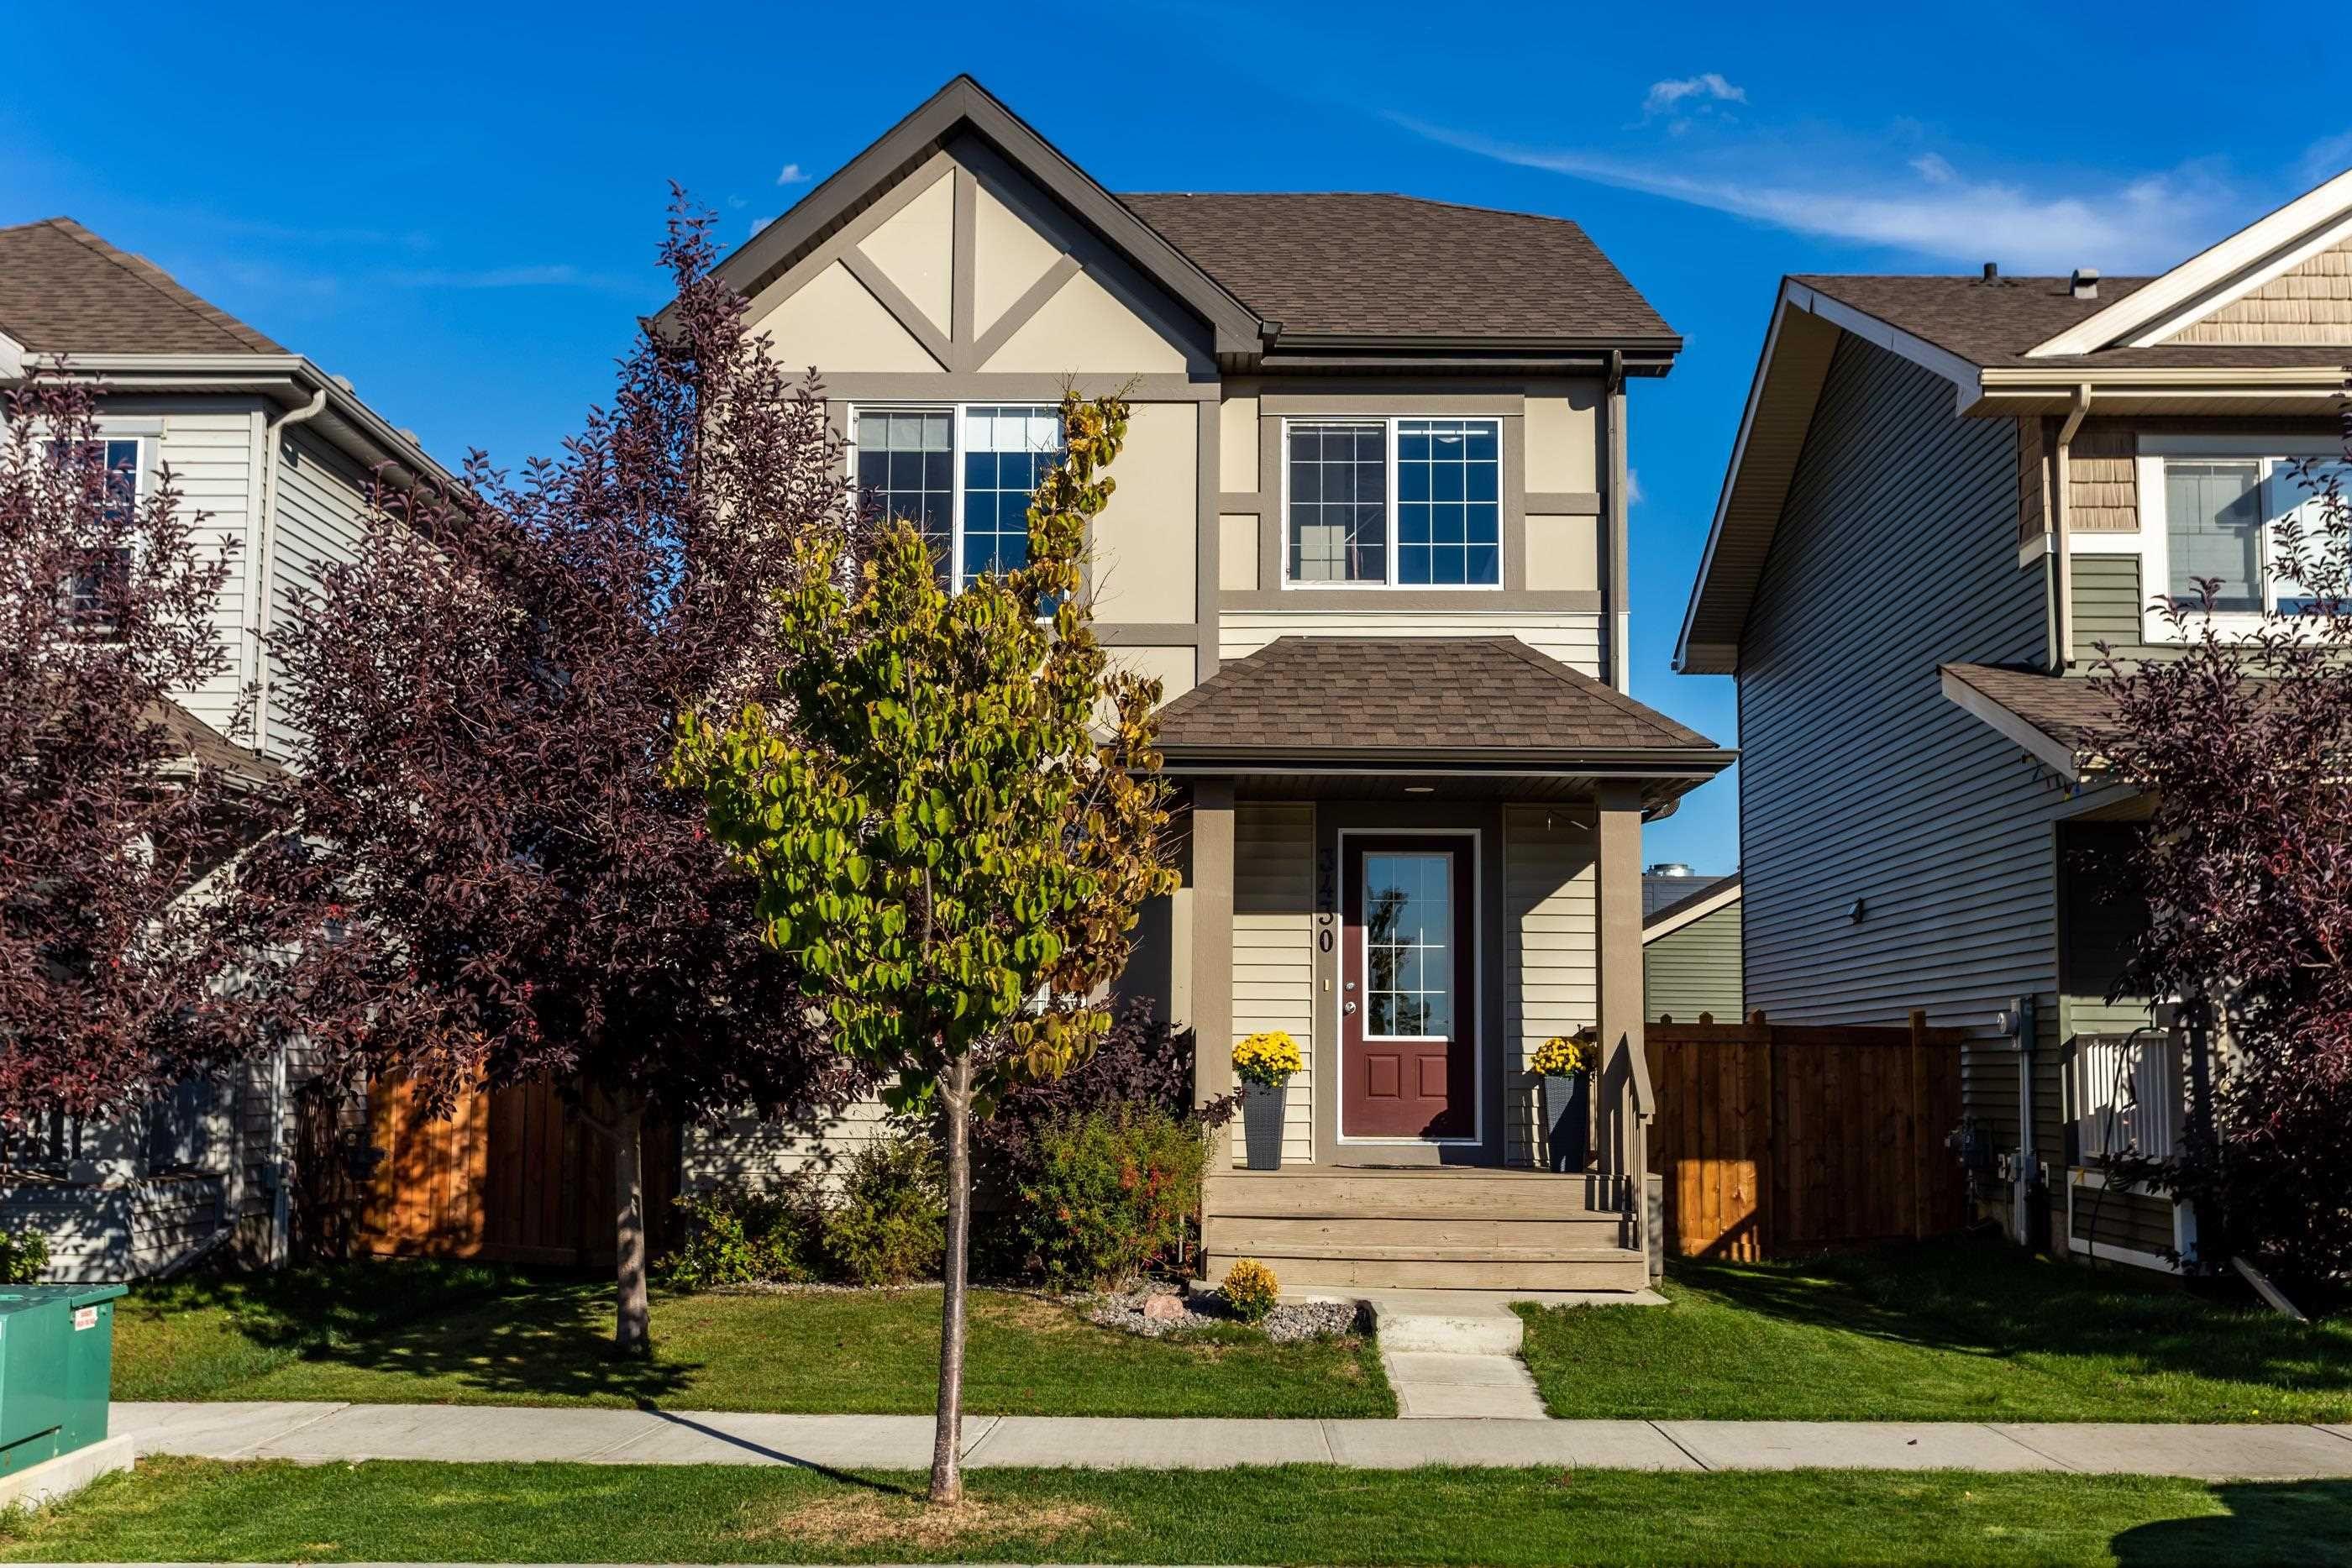 Main Photo: 3430 CUTLER Crescent in Edmonton: Zone 55 House for sale : MLS®# E4264146